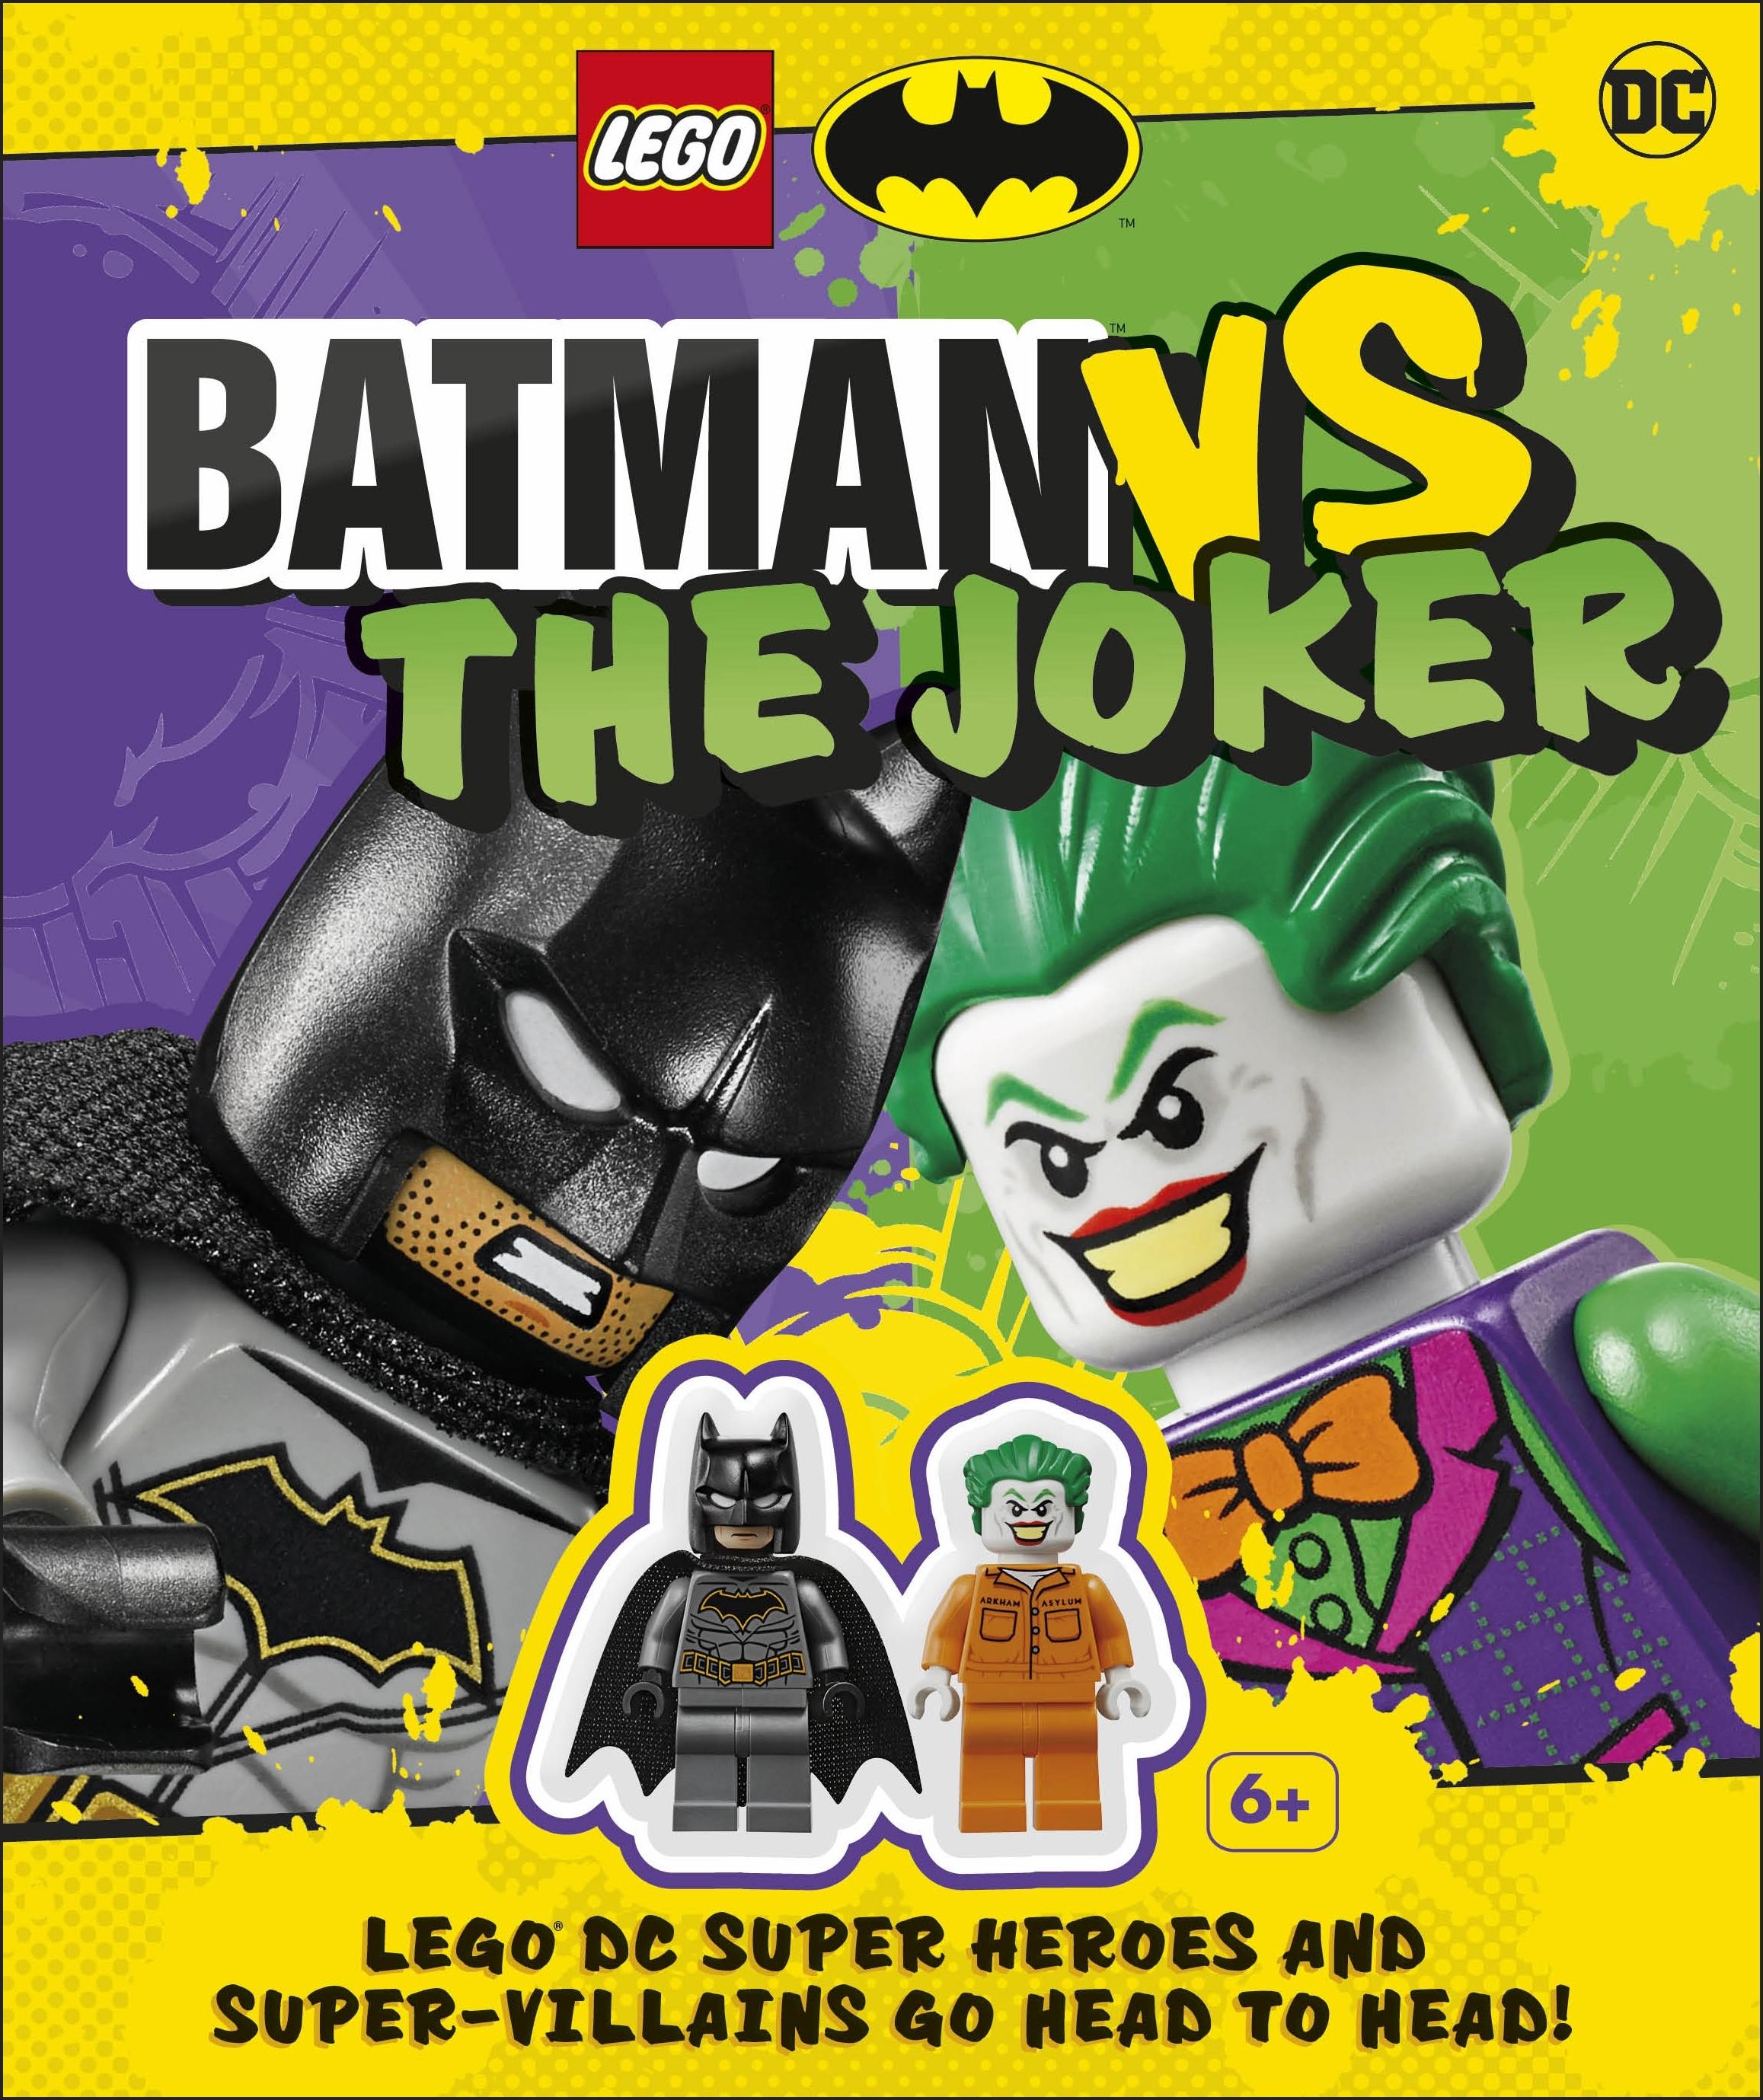 Lego Batman Batman Vs The Joker By Julia March Penguin Books Australia